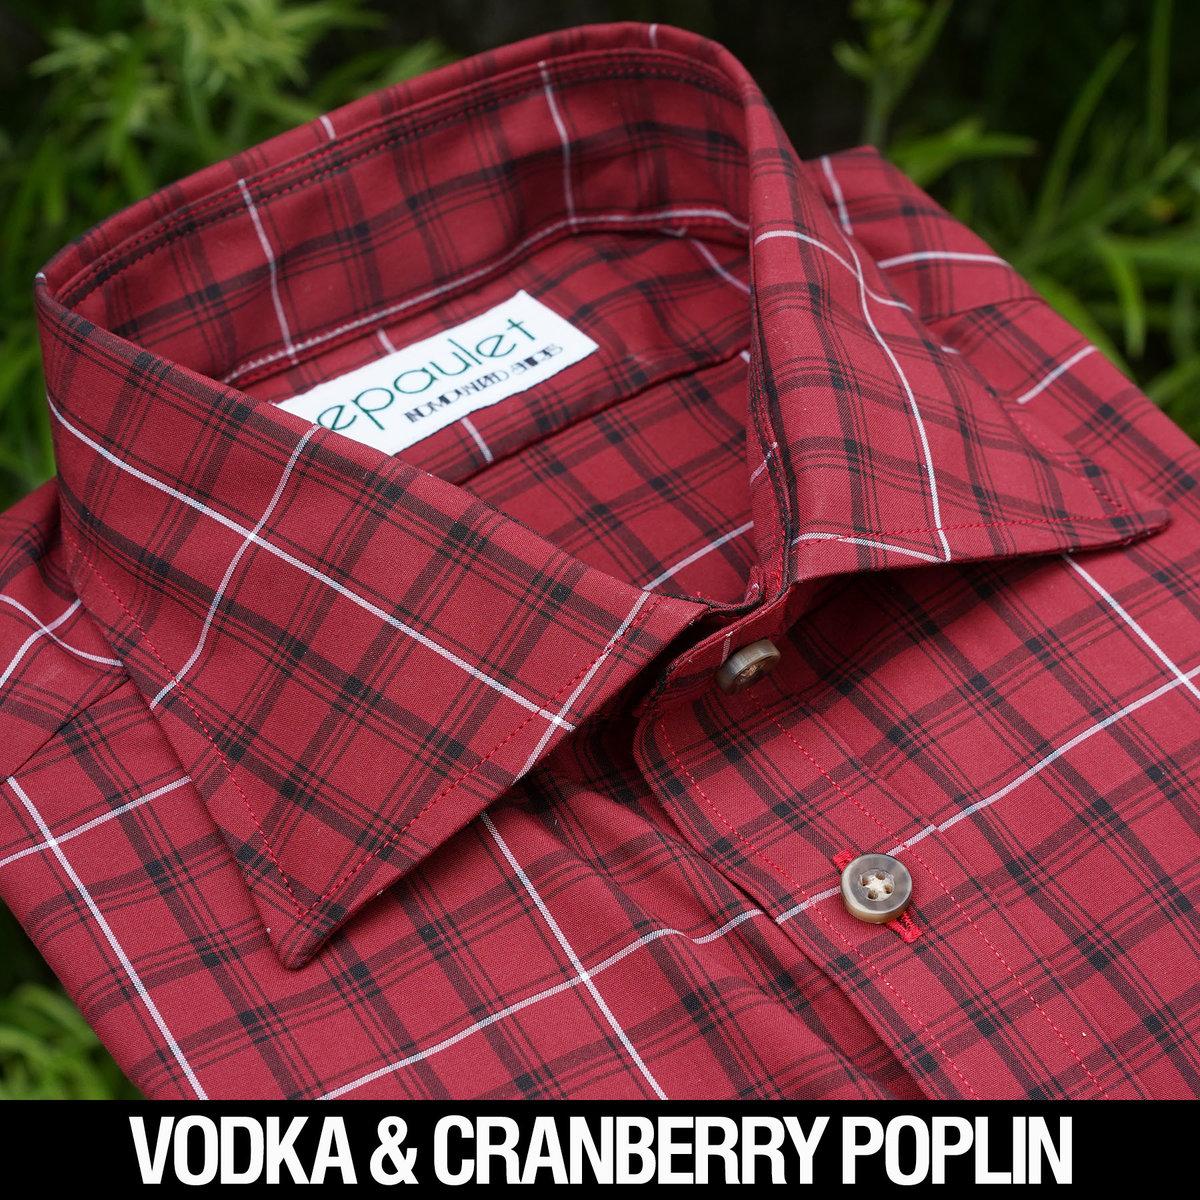 Vodka & Cranberry Poplin.jpg